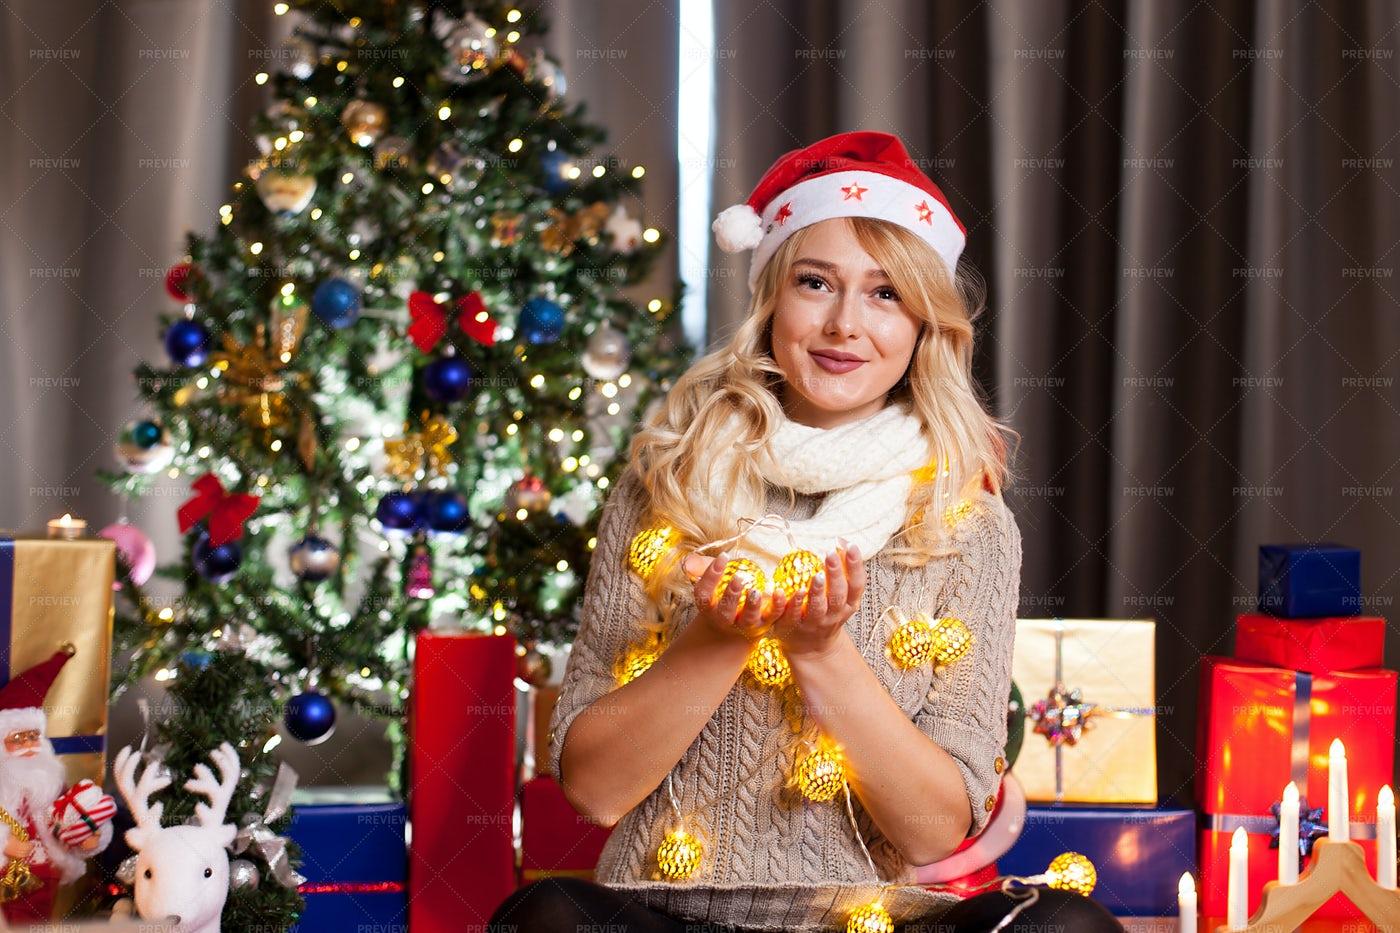 Woman Holding Christmas Lights: Stock Photos